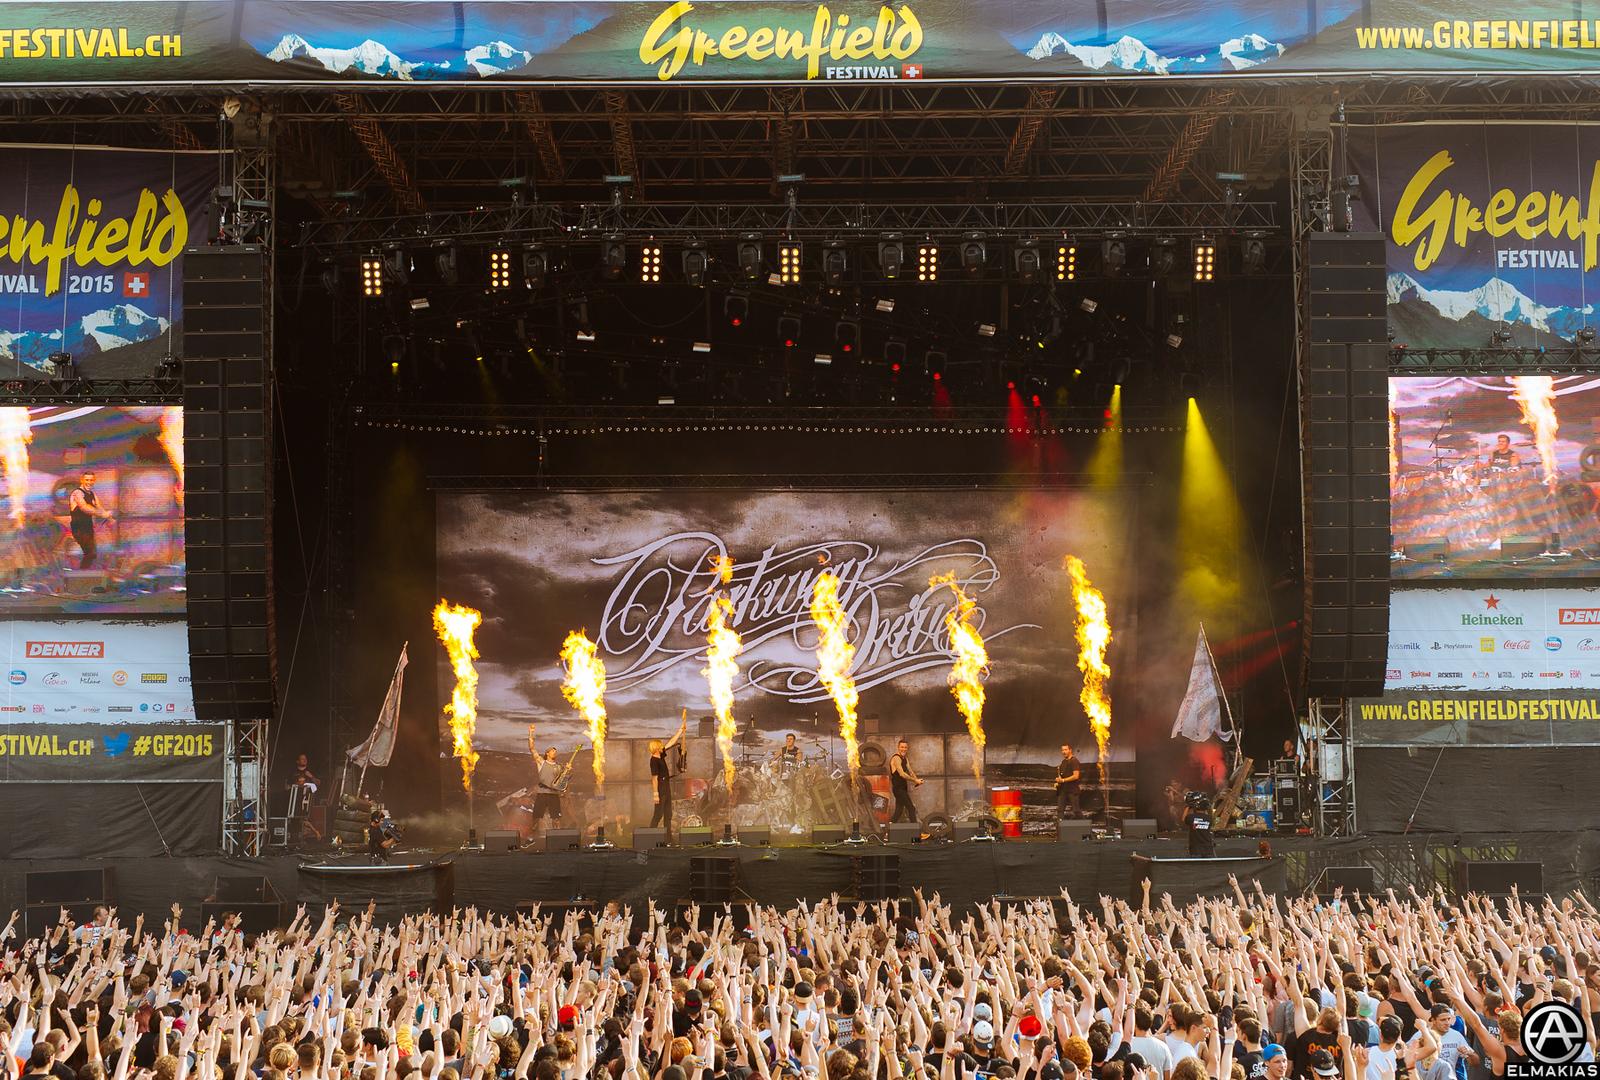 Parkway Drive live at Greenfield Festival in Interlaken, Switzerland